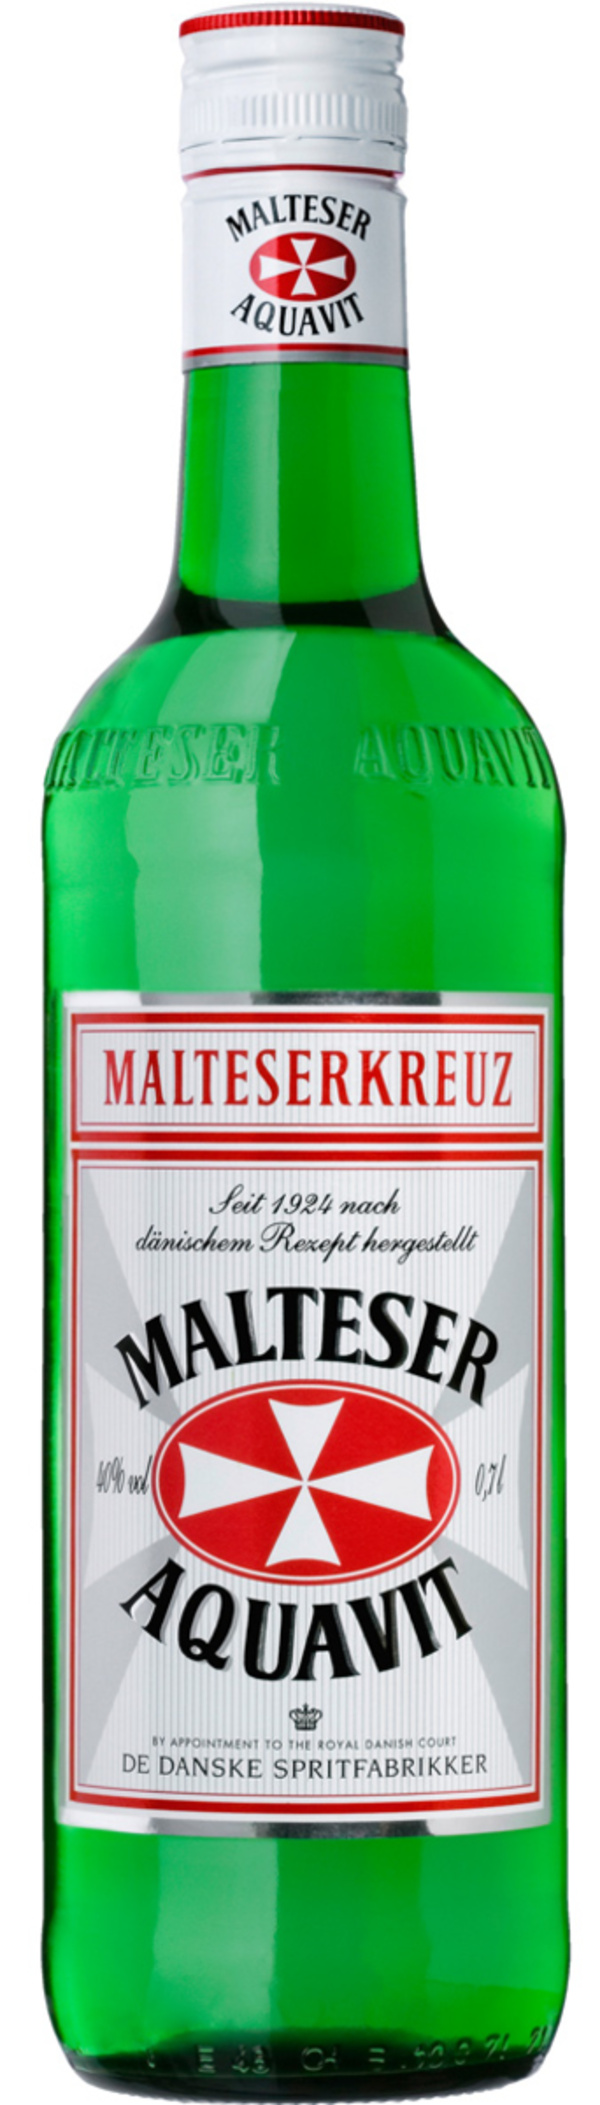 Malteserkreuz Aquavit 0,7 ltr